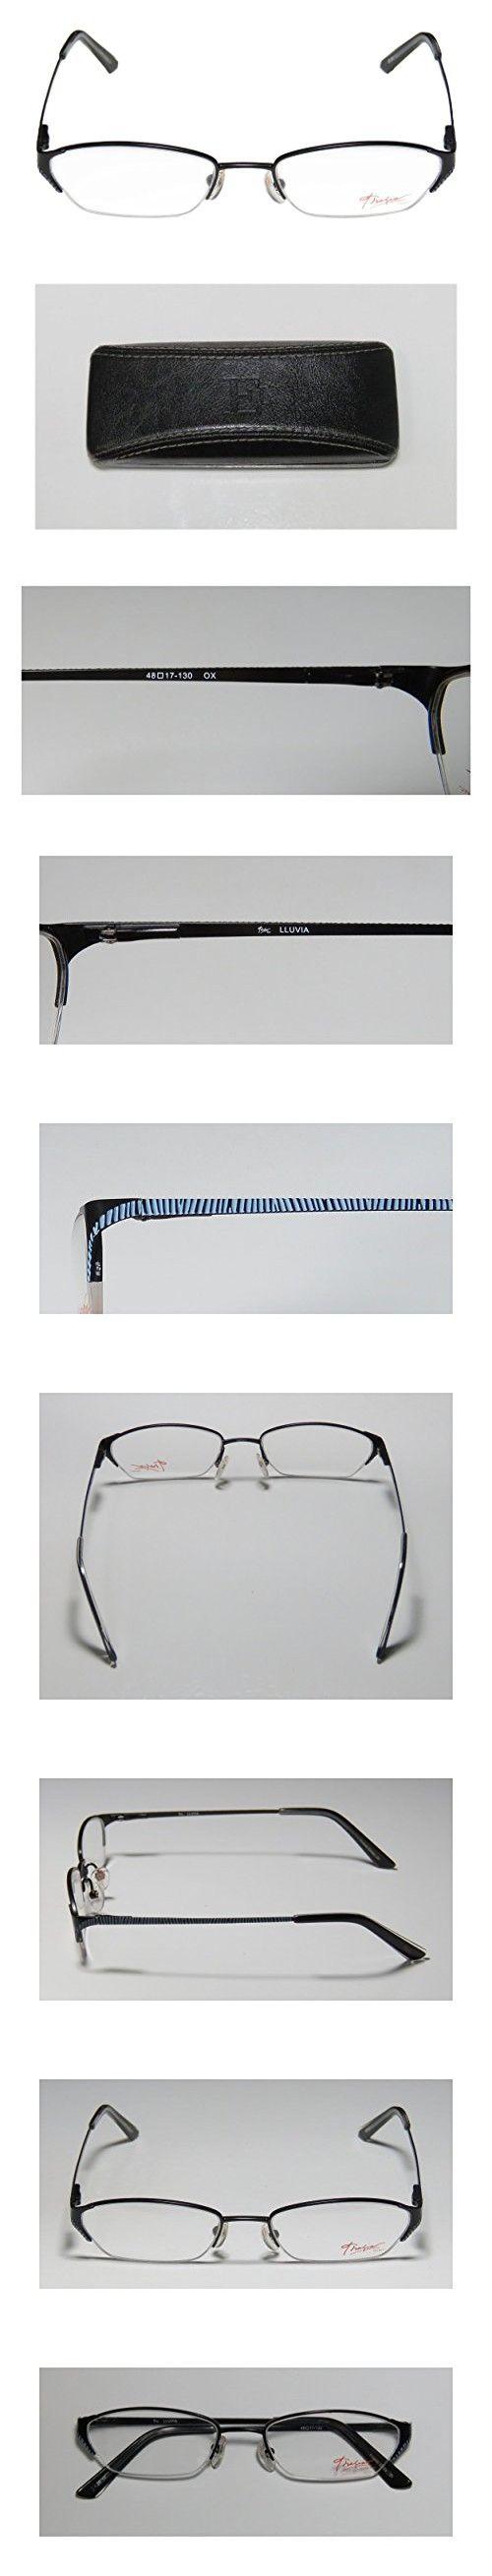 Thalia Lluvia Womens/Ladies Ophthalmic Clearance Designer Half-rim Spring Hinges Eyeglasses/Spectacles (48-17-130, Onyx / Blue)